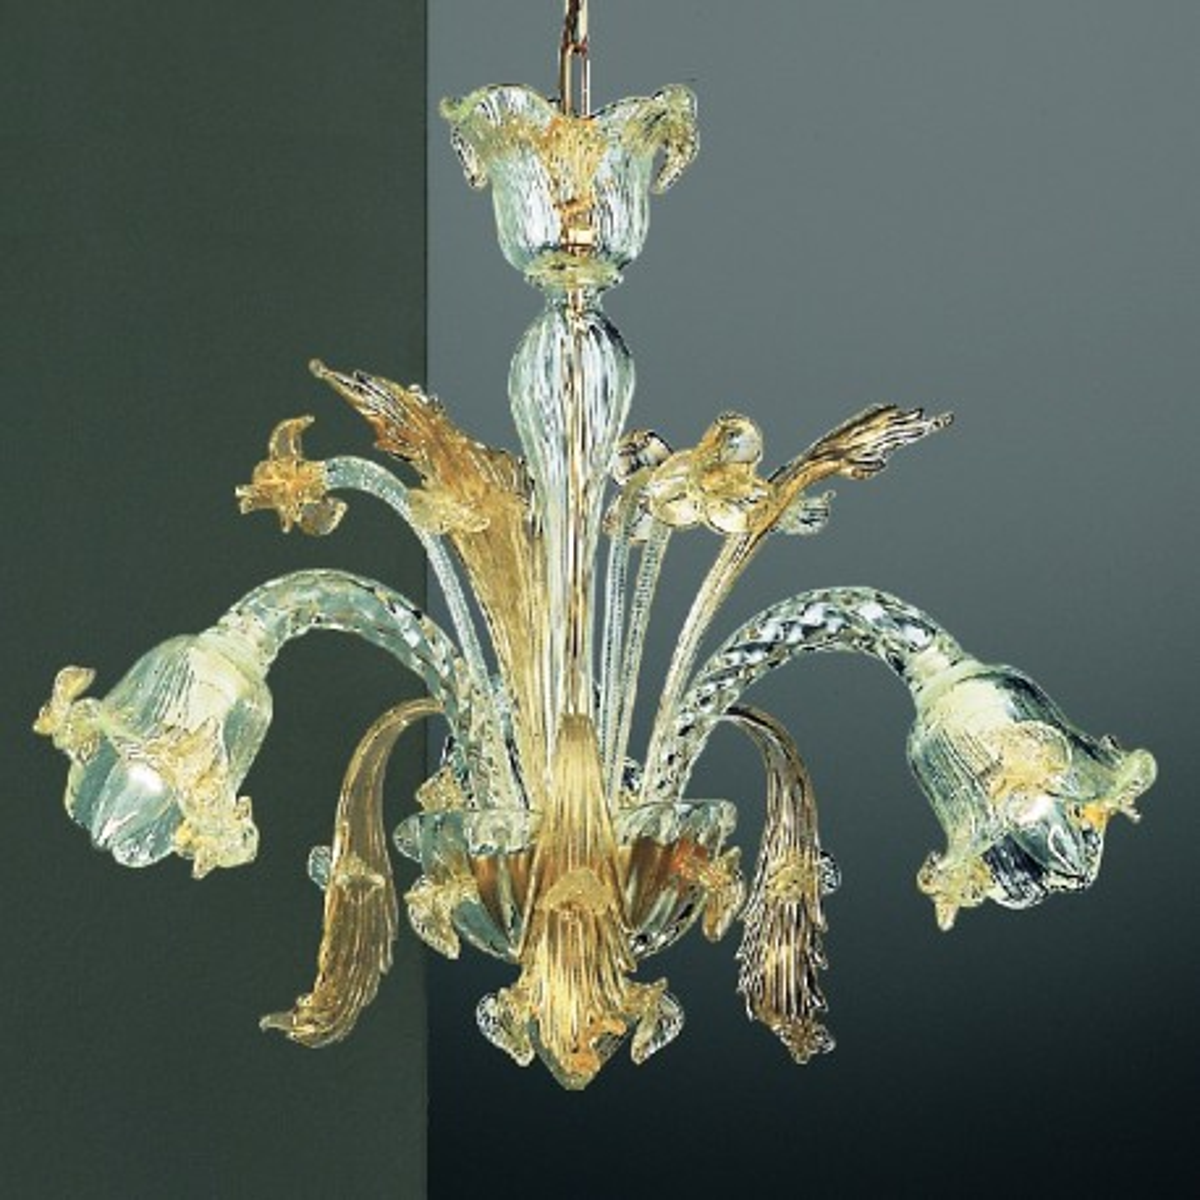 Vivaldi 3 lights Murano chandelier - transparent gold color